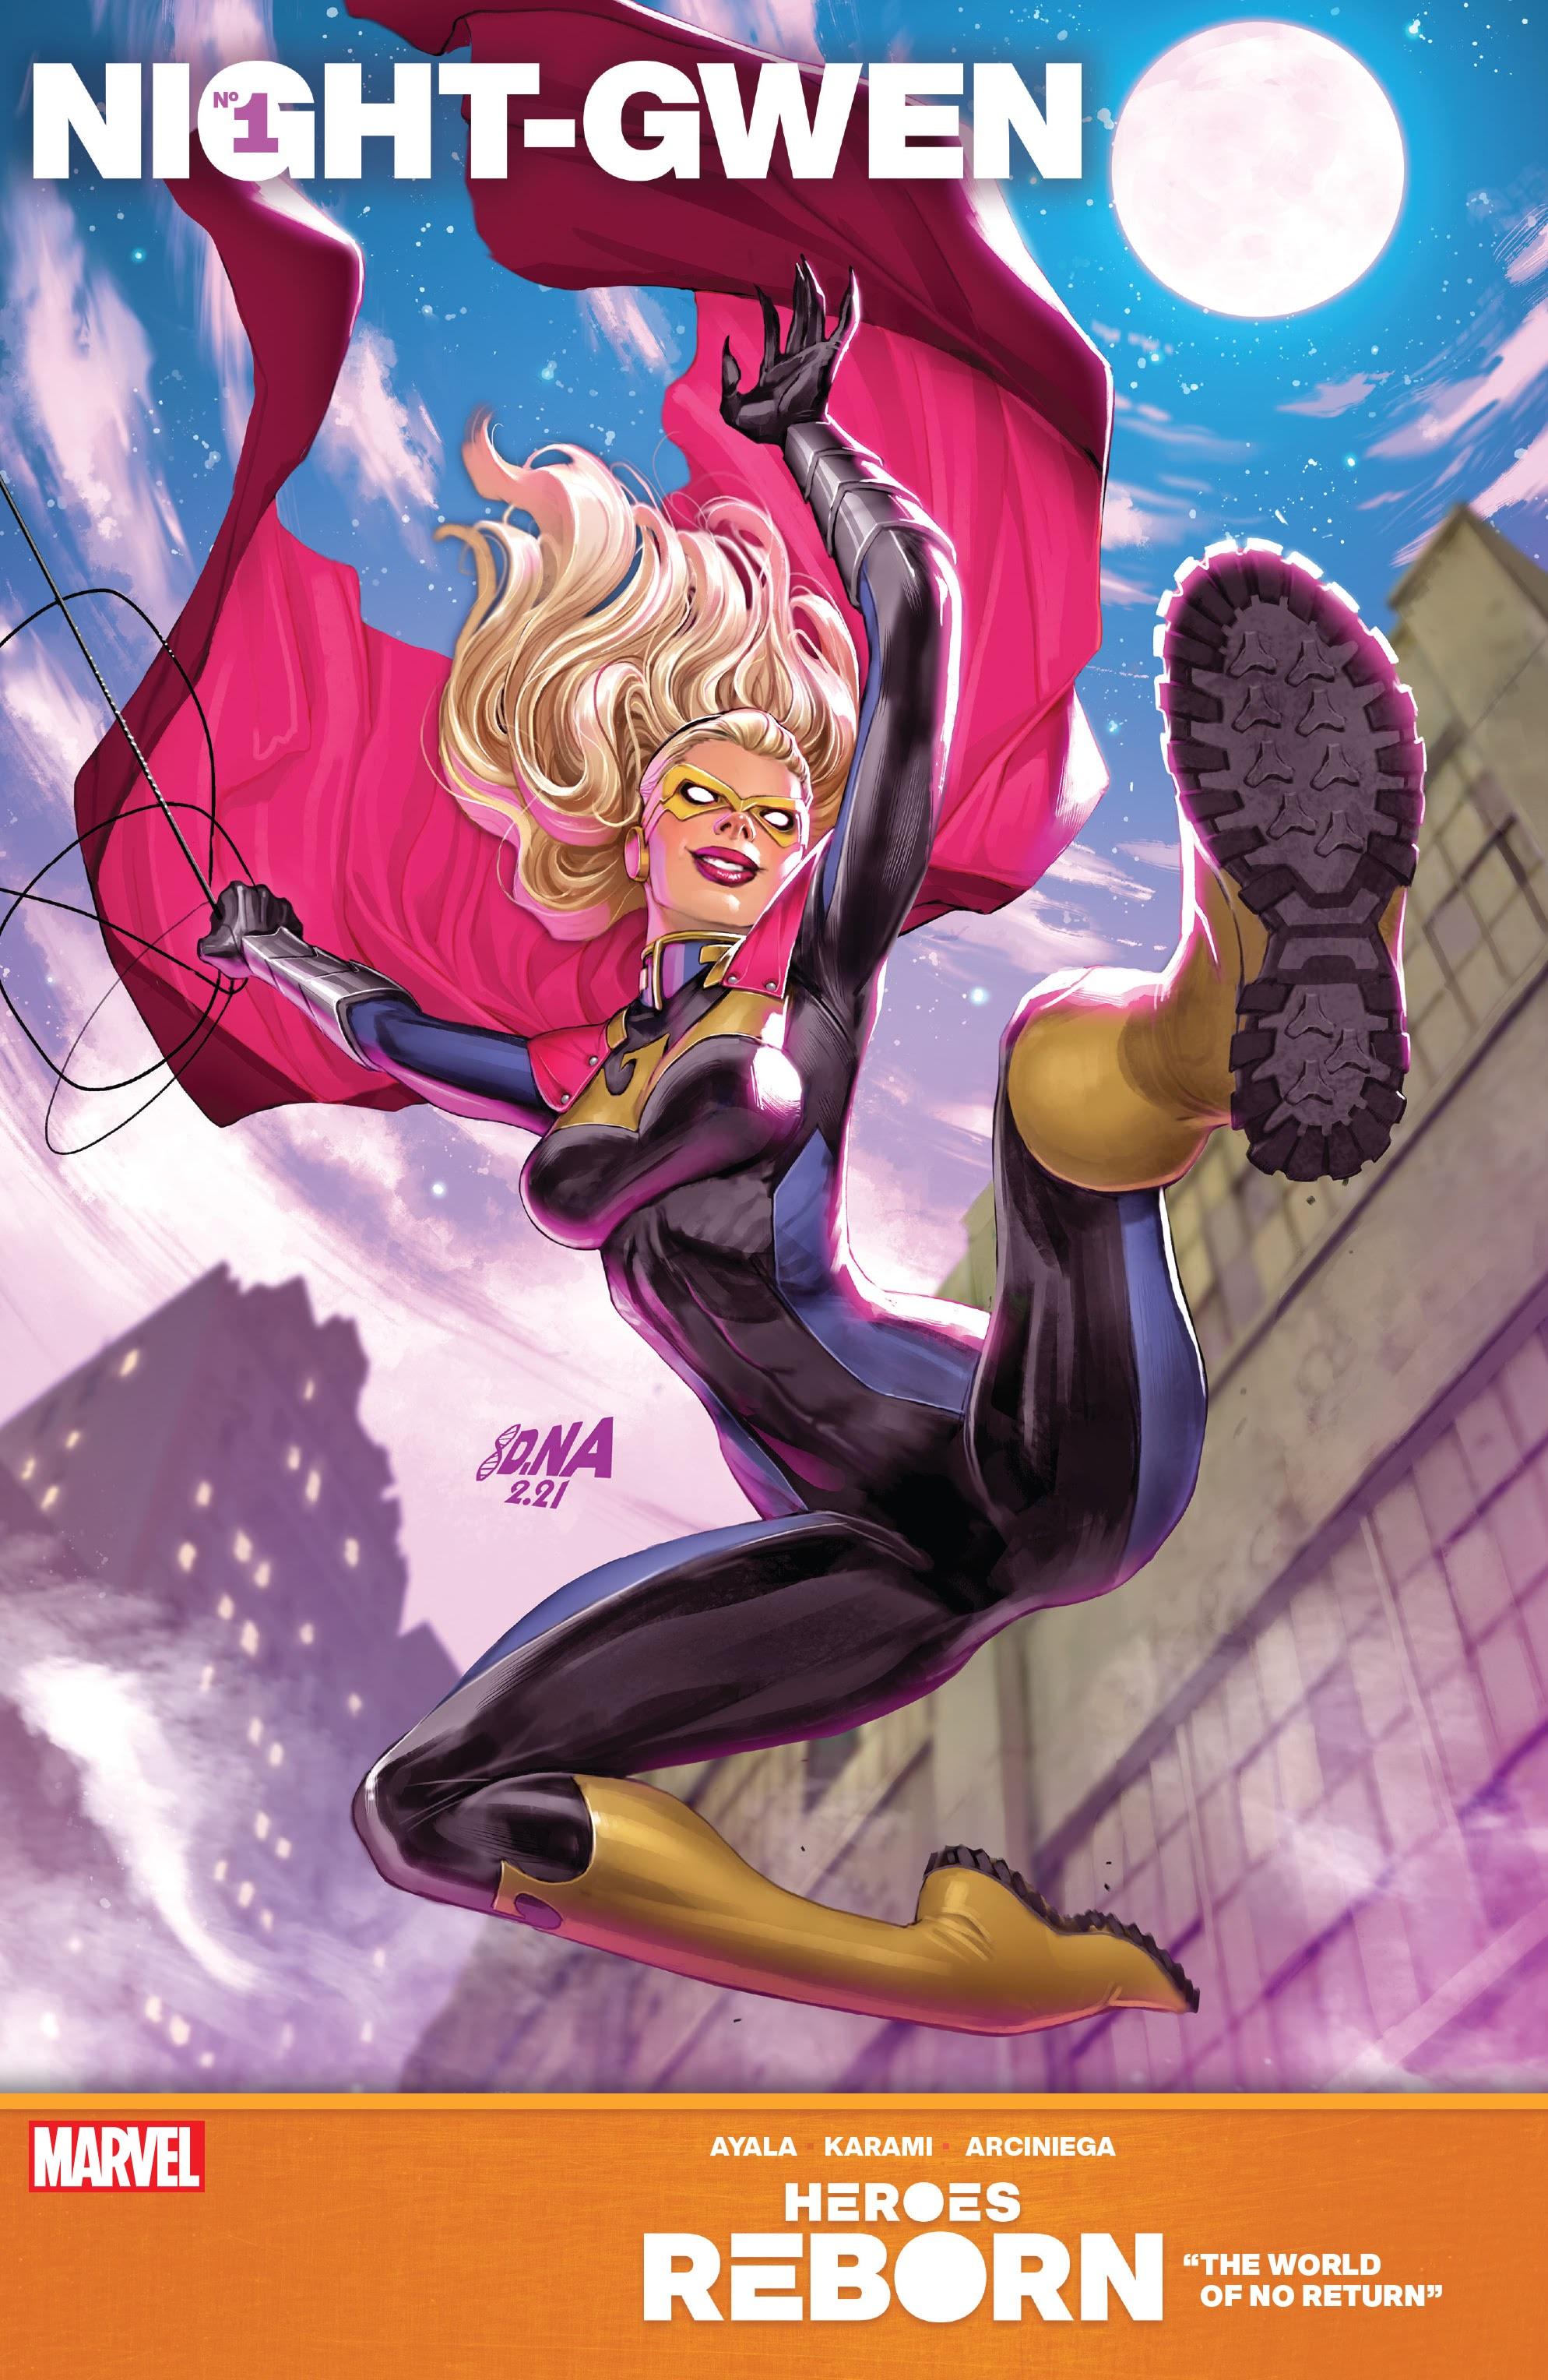 Heroes Reborn: One-Shots Night-Gwen Page 1